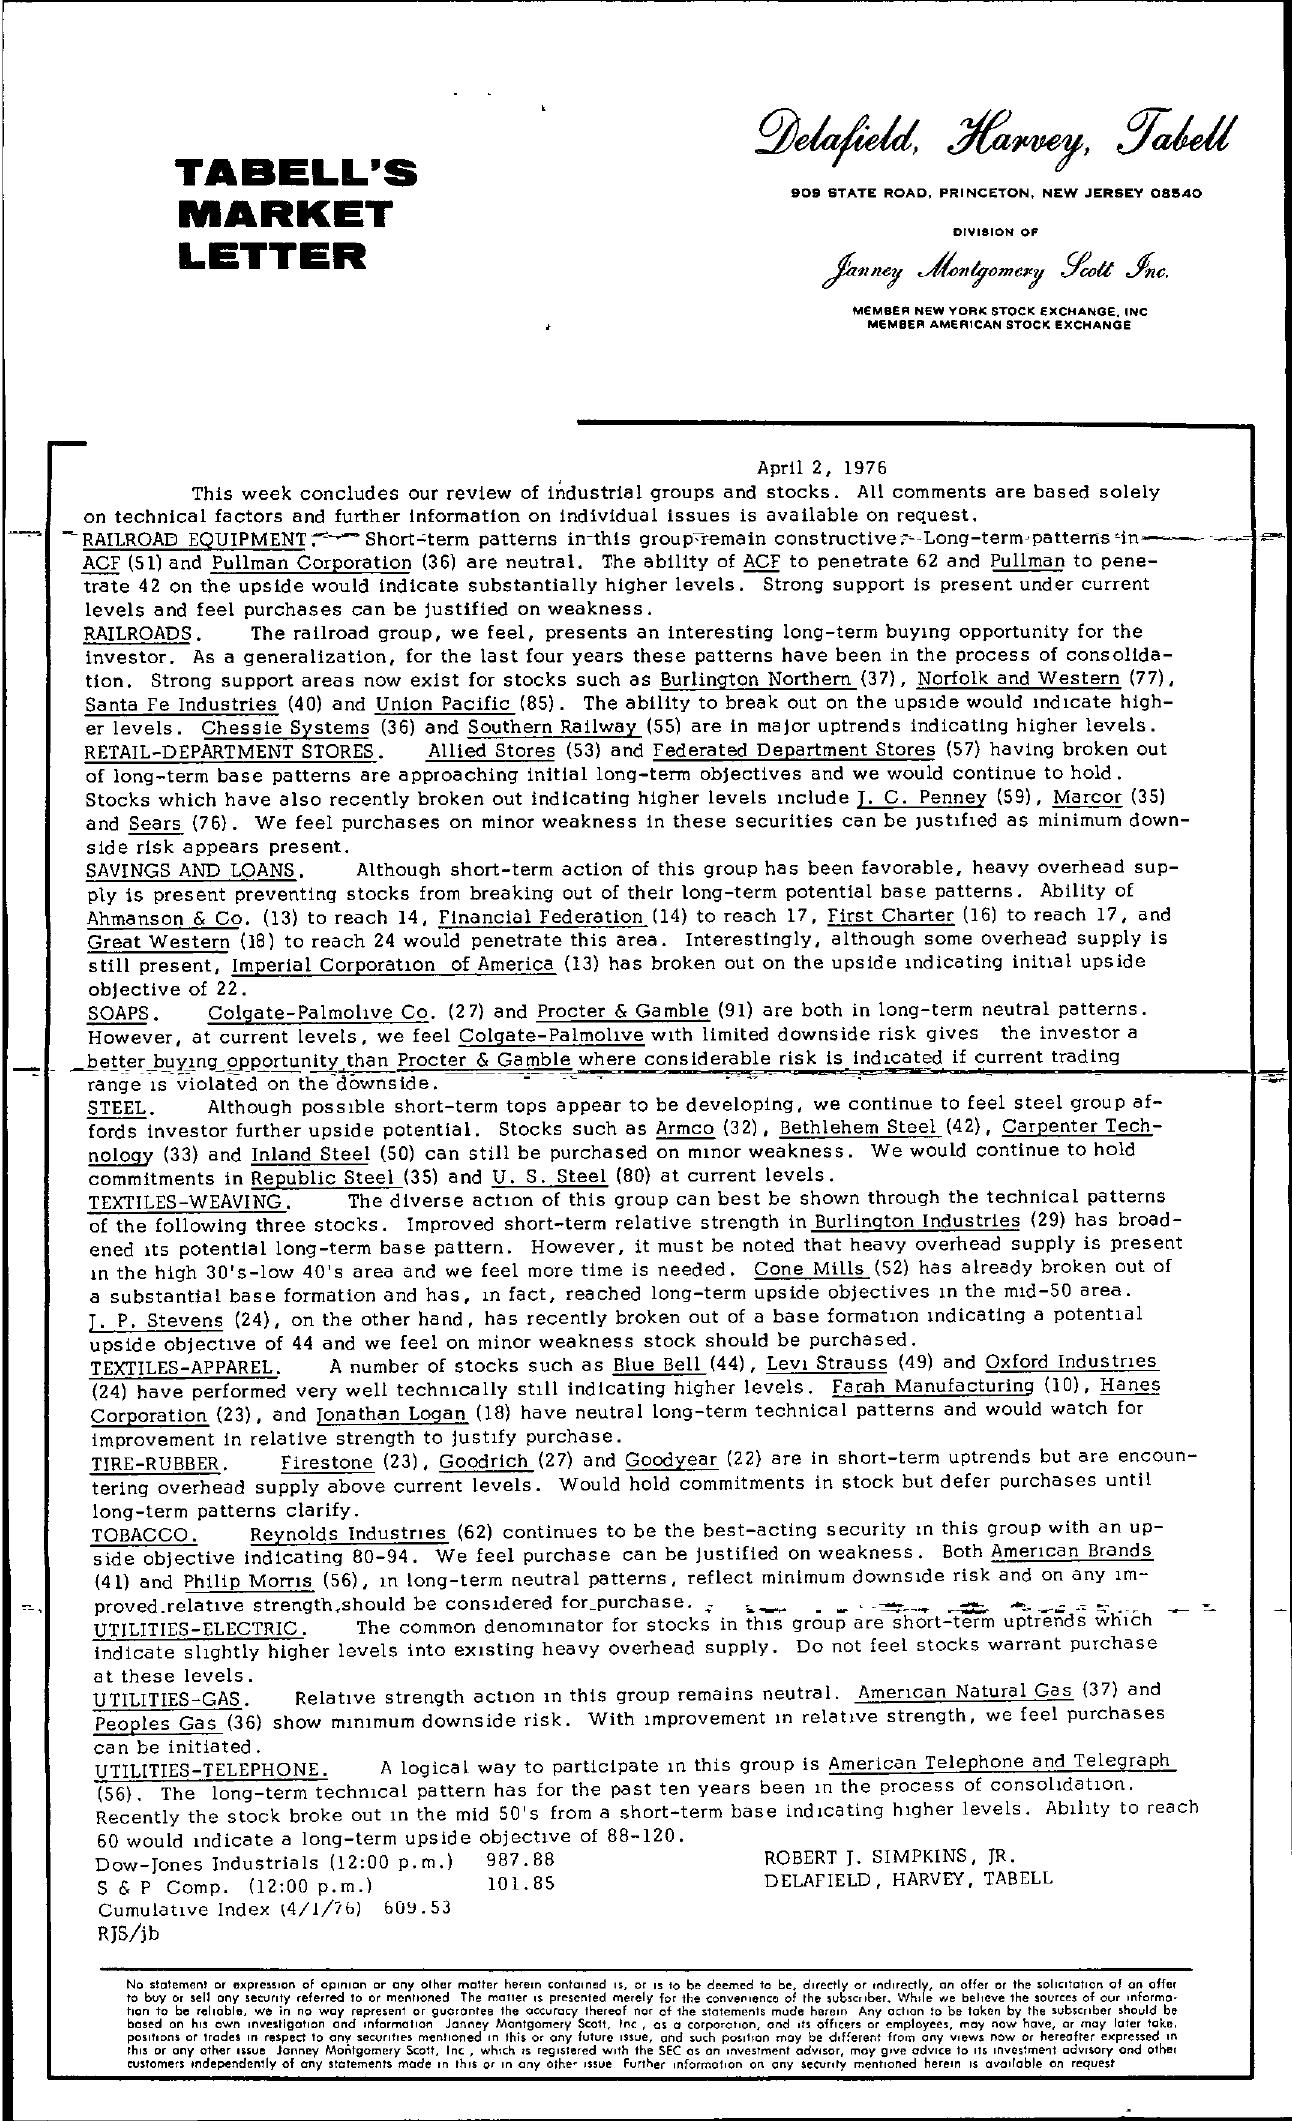 Tabell's Market Letter - April 02, 1976